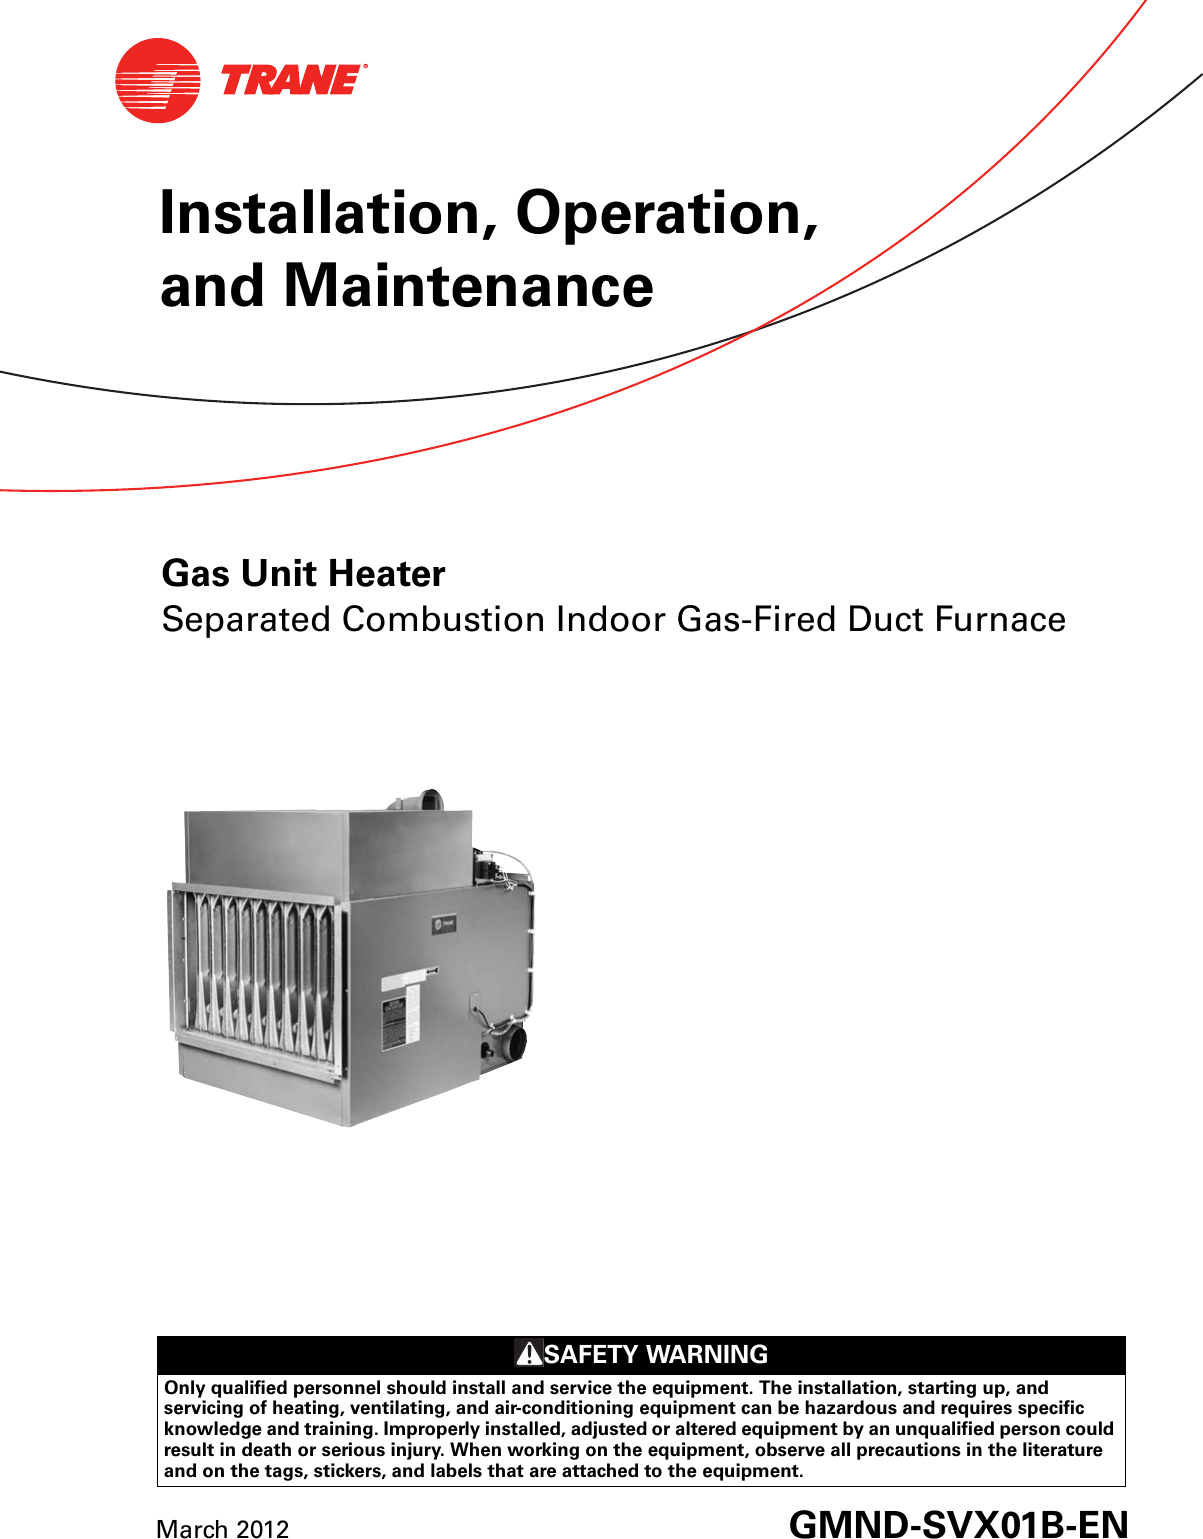 trane gas unit heaters installation and maintenance manual gmnd rh usermanual wiki Trane Product Manuals Trane Air Conditioner Parts Manual